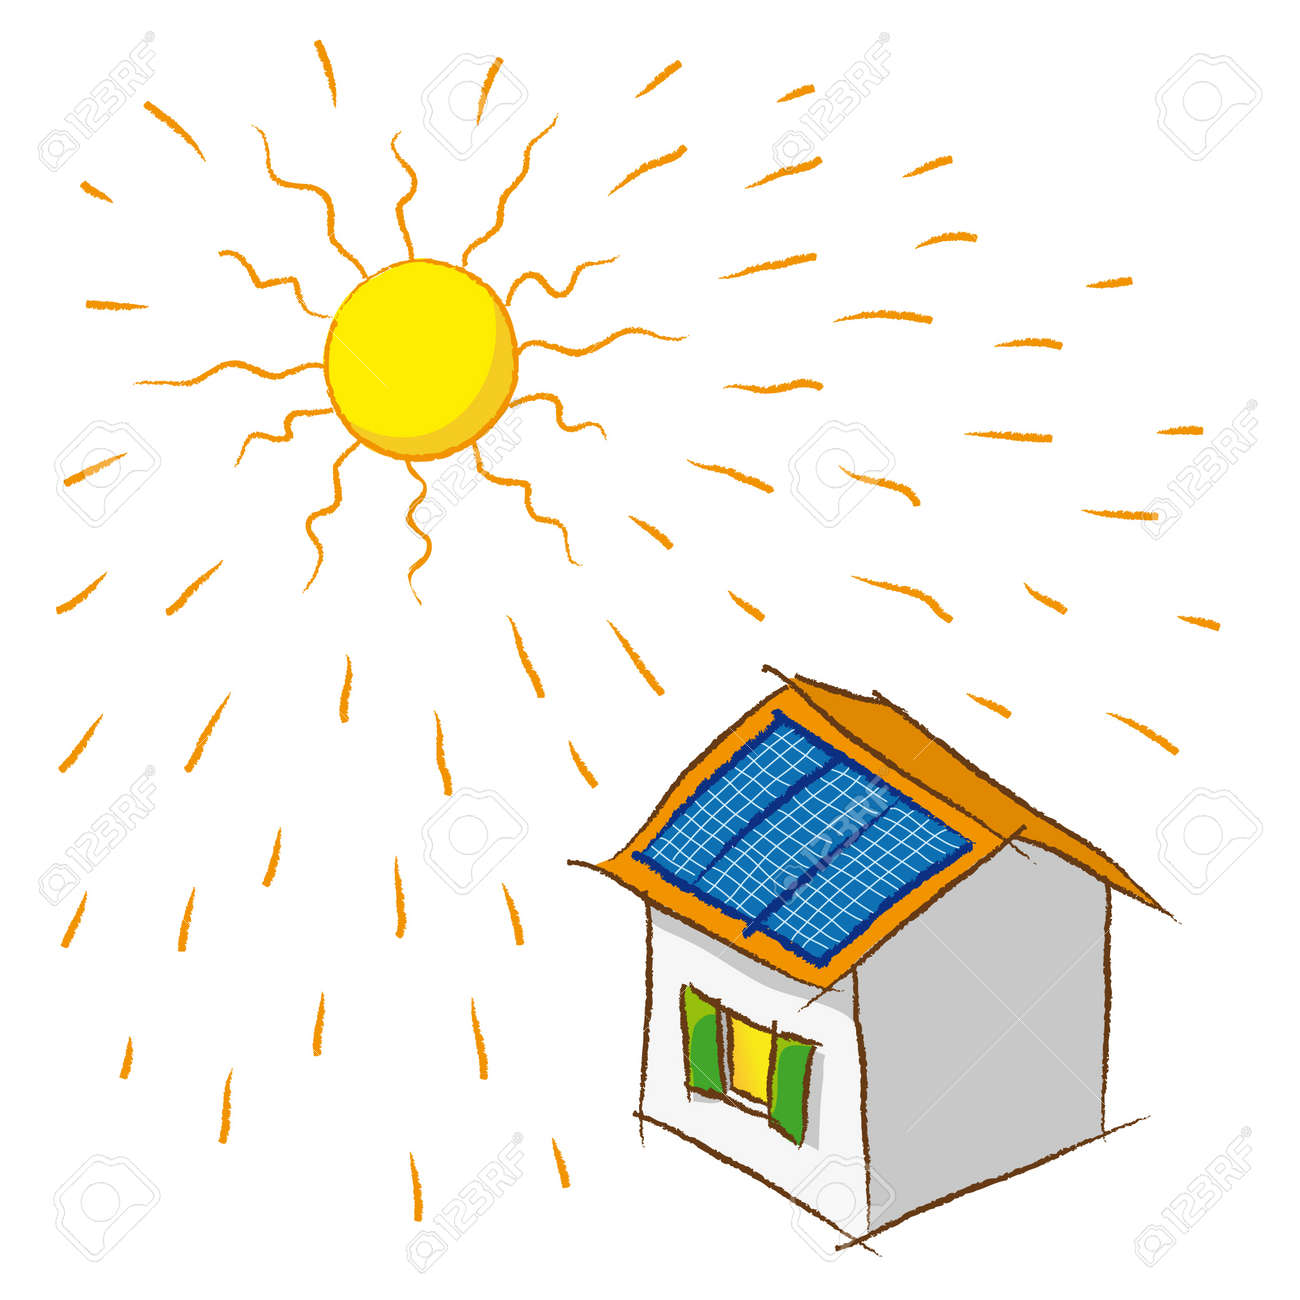 solar energy royalty free cliparts vectors and stock illustration rh 123rf com solar energy pictures clip art renewable energy clipart